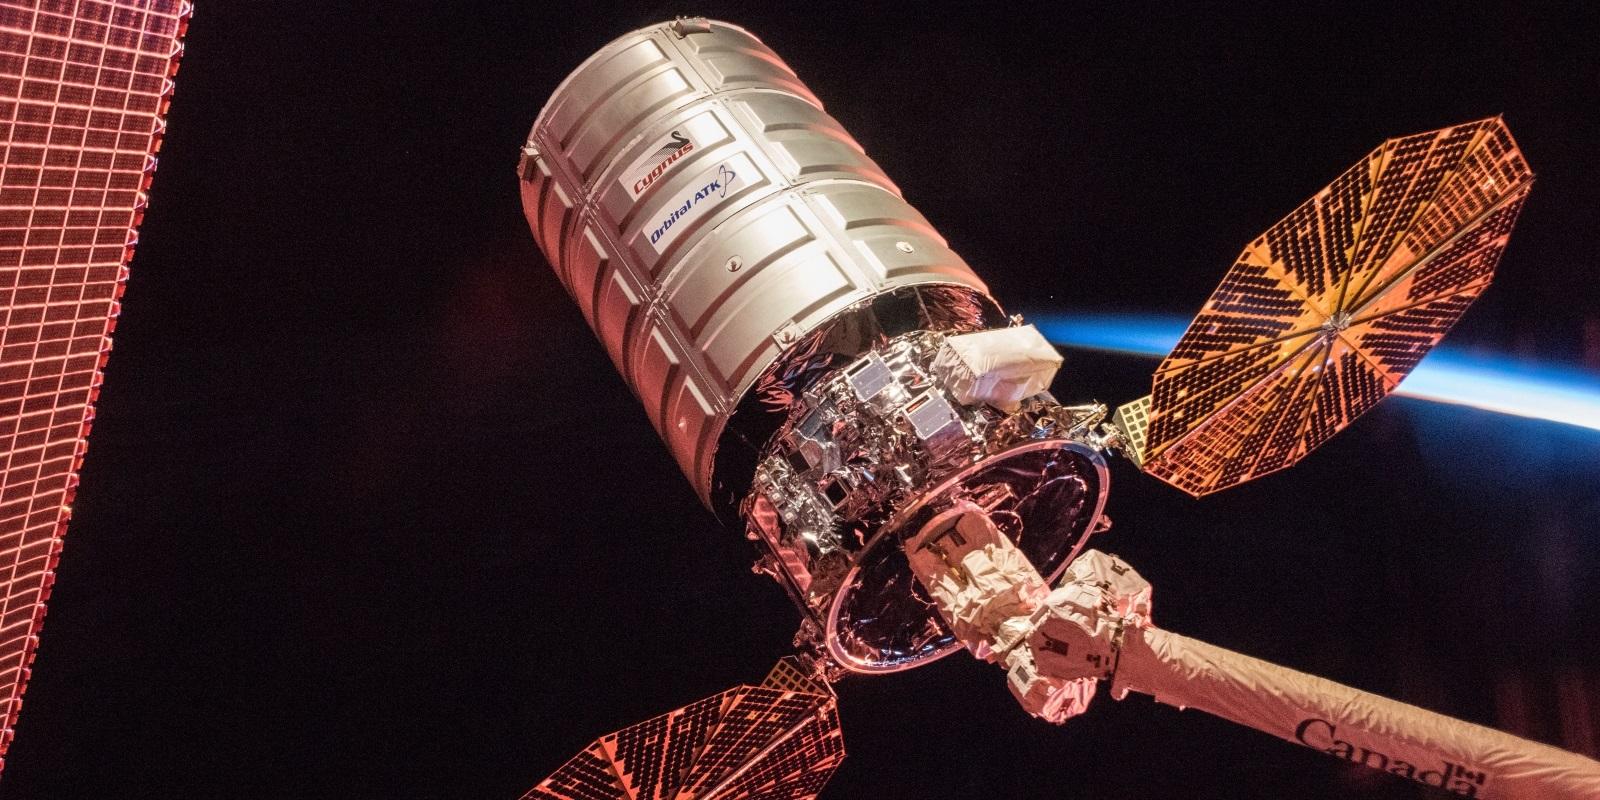 U.S. Commercial Cargo Spacecraft Departs International Space Station – 2018-01-13